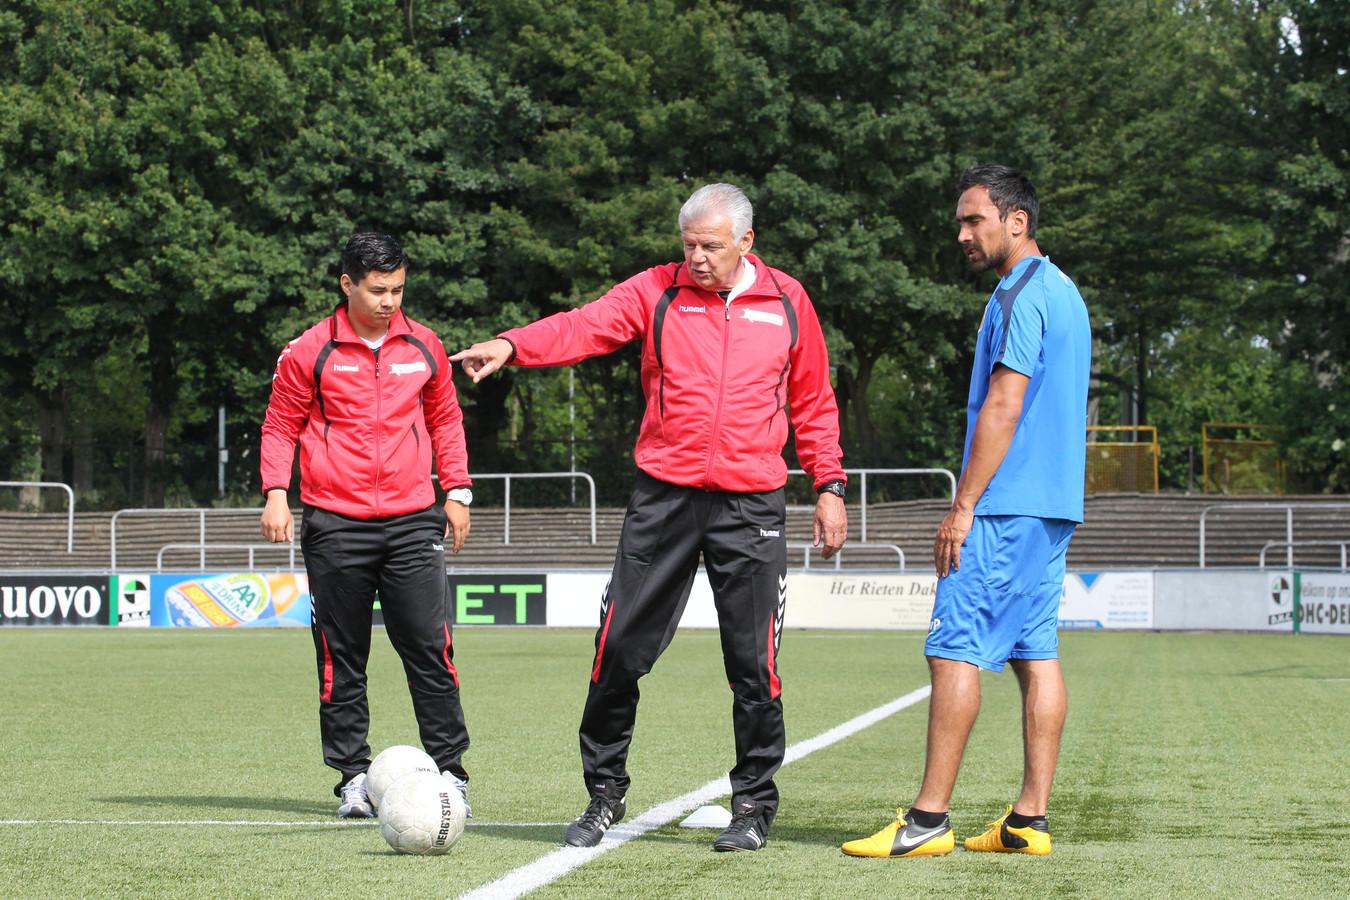 Chris Kronshorst (m) en Jason Vermeer (l) geven training.